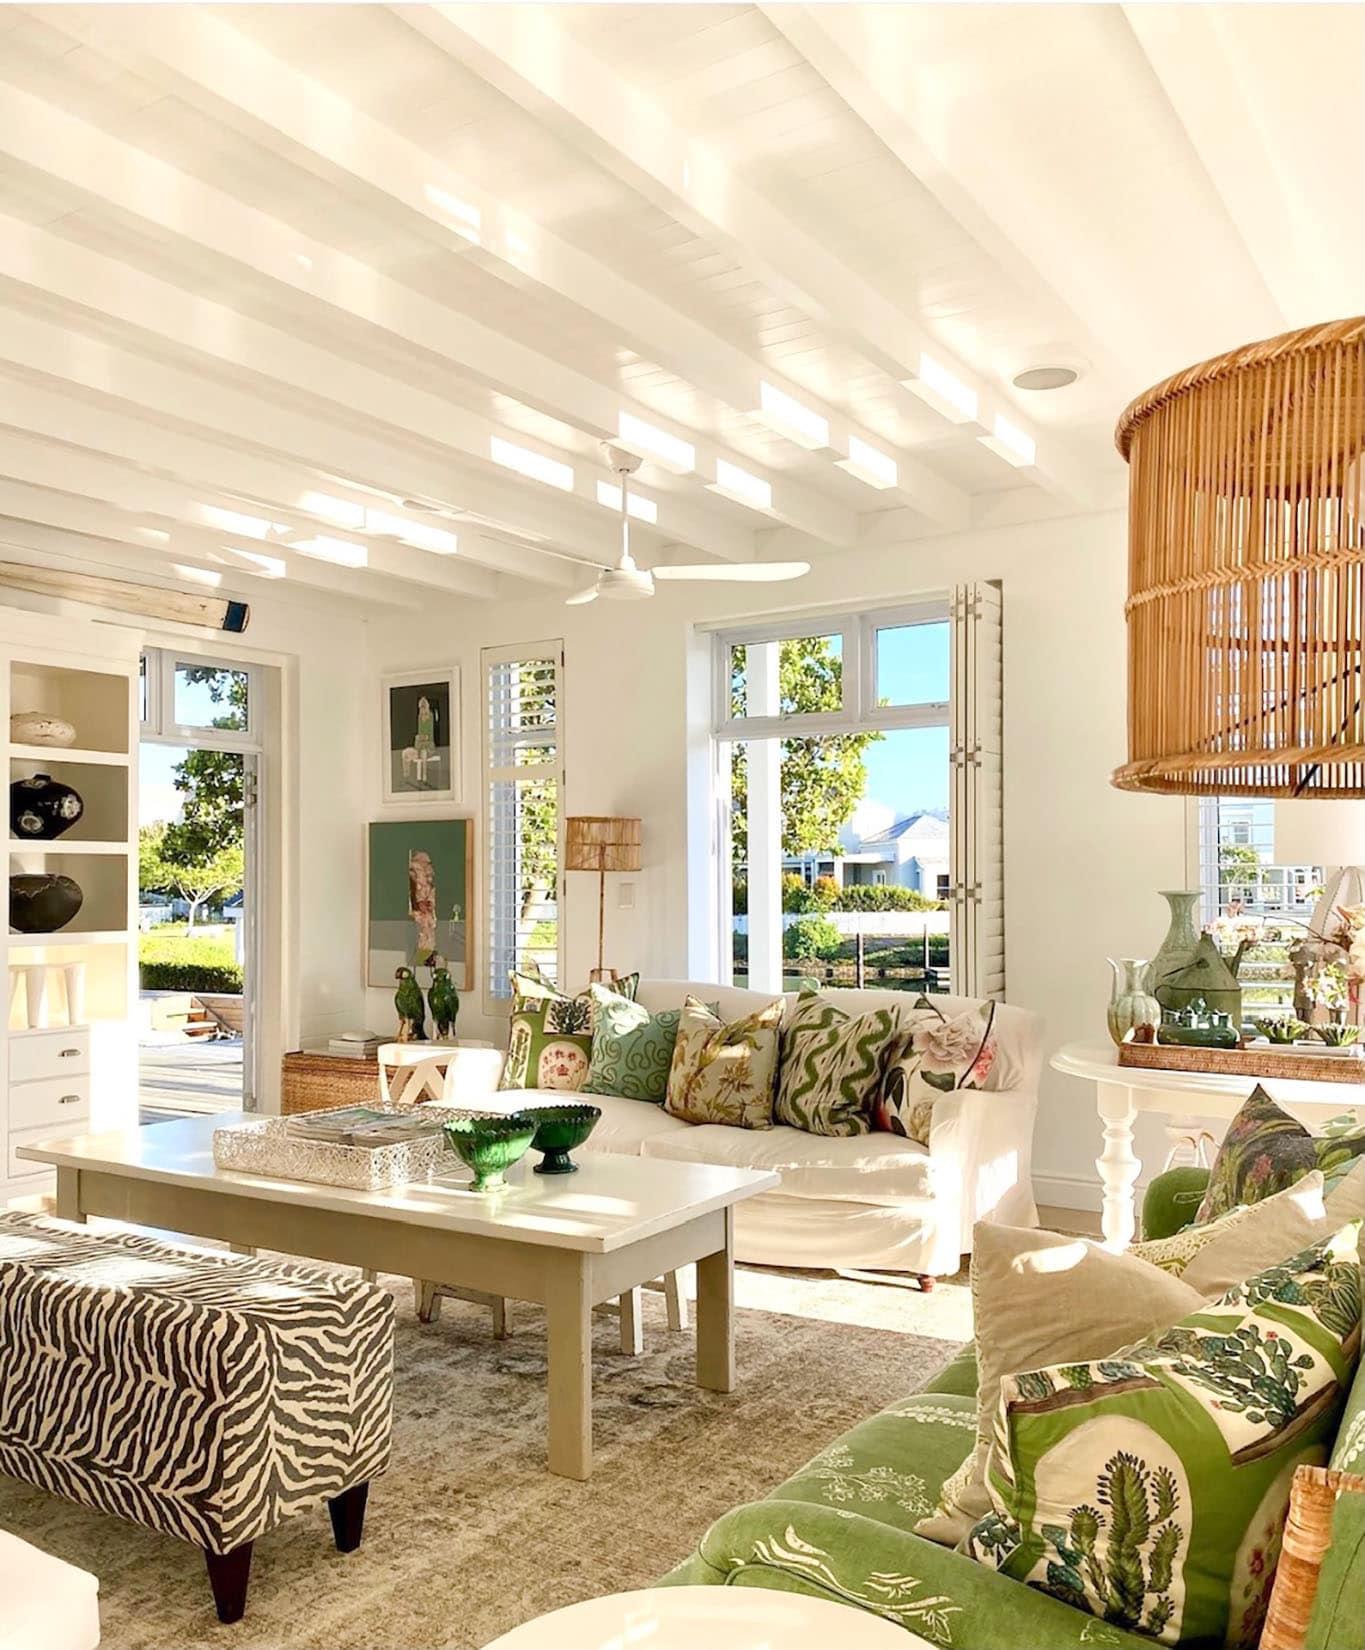 sue bond's gorgeous family room